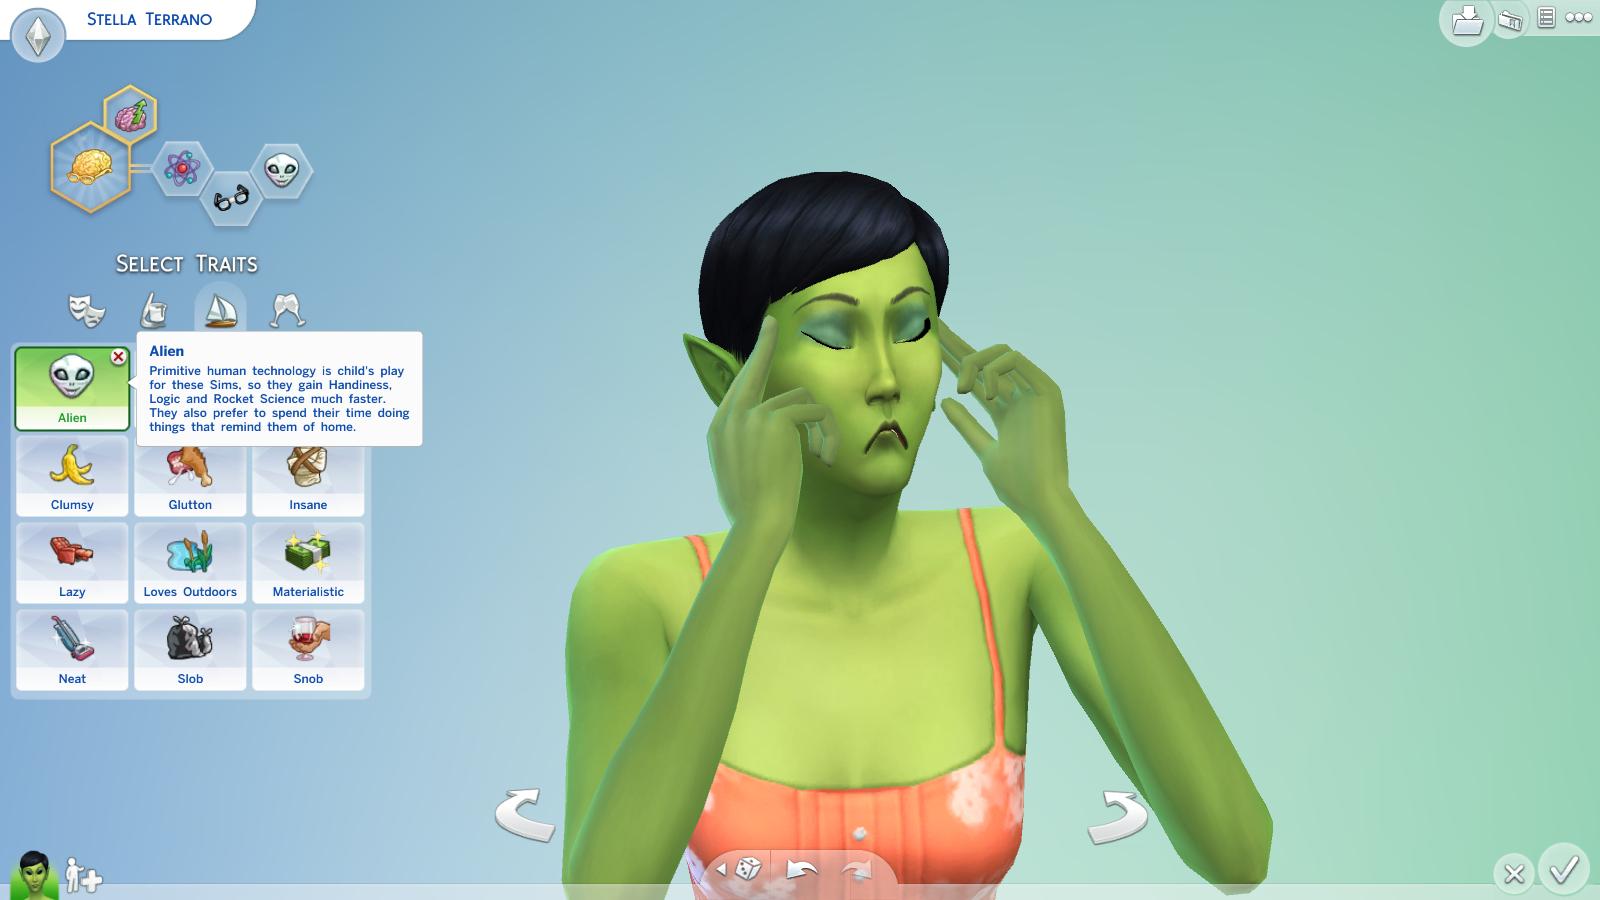 Custom Catalog Thumbnails at Sims 4 Studio » Sims 4 Updates